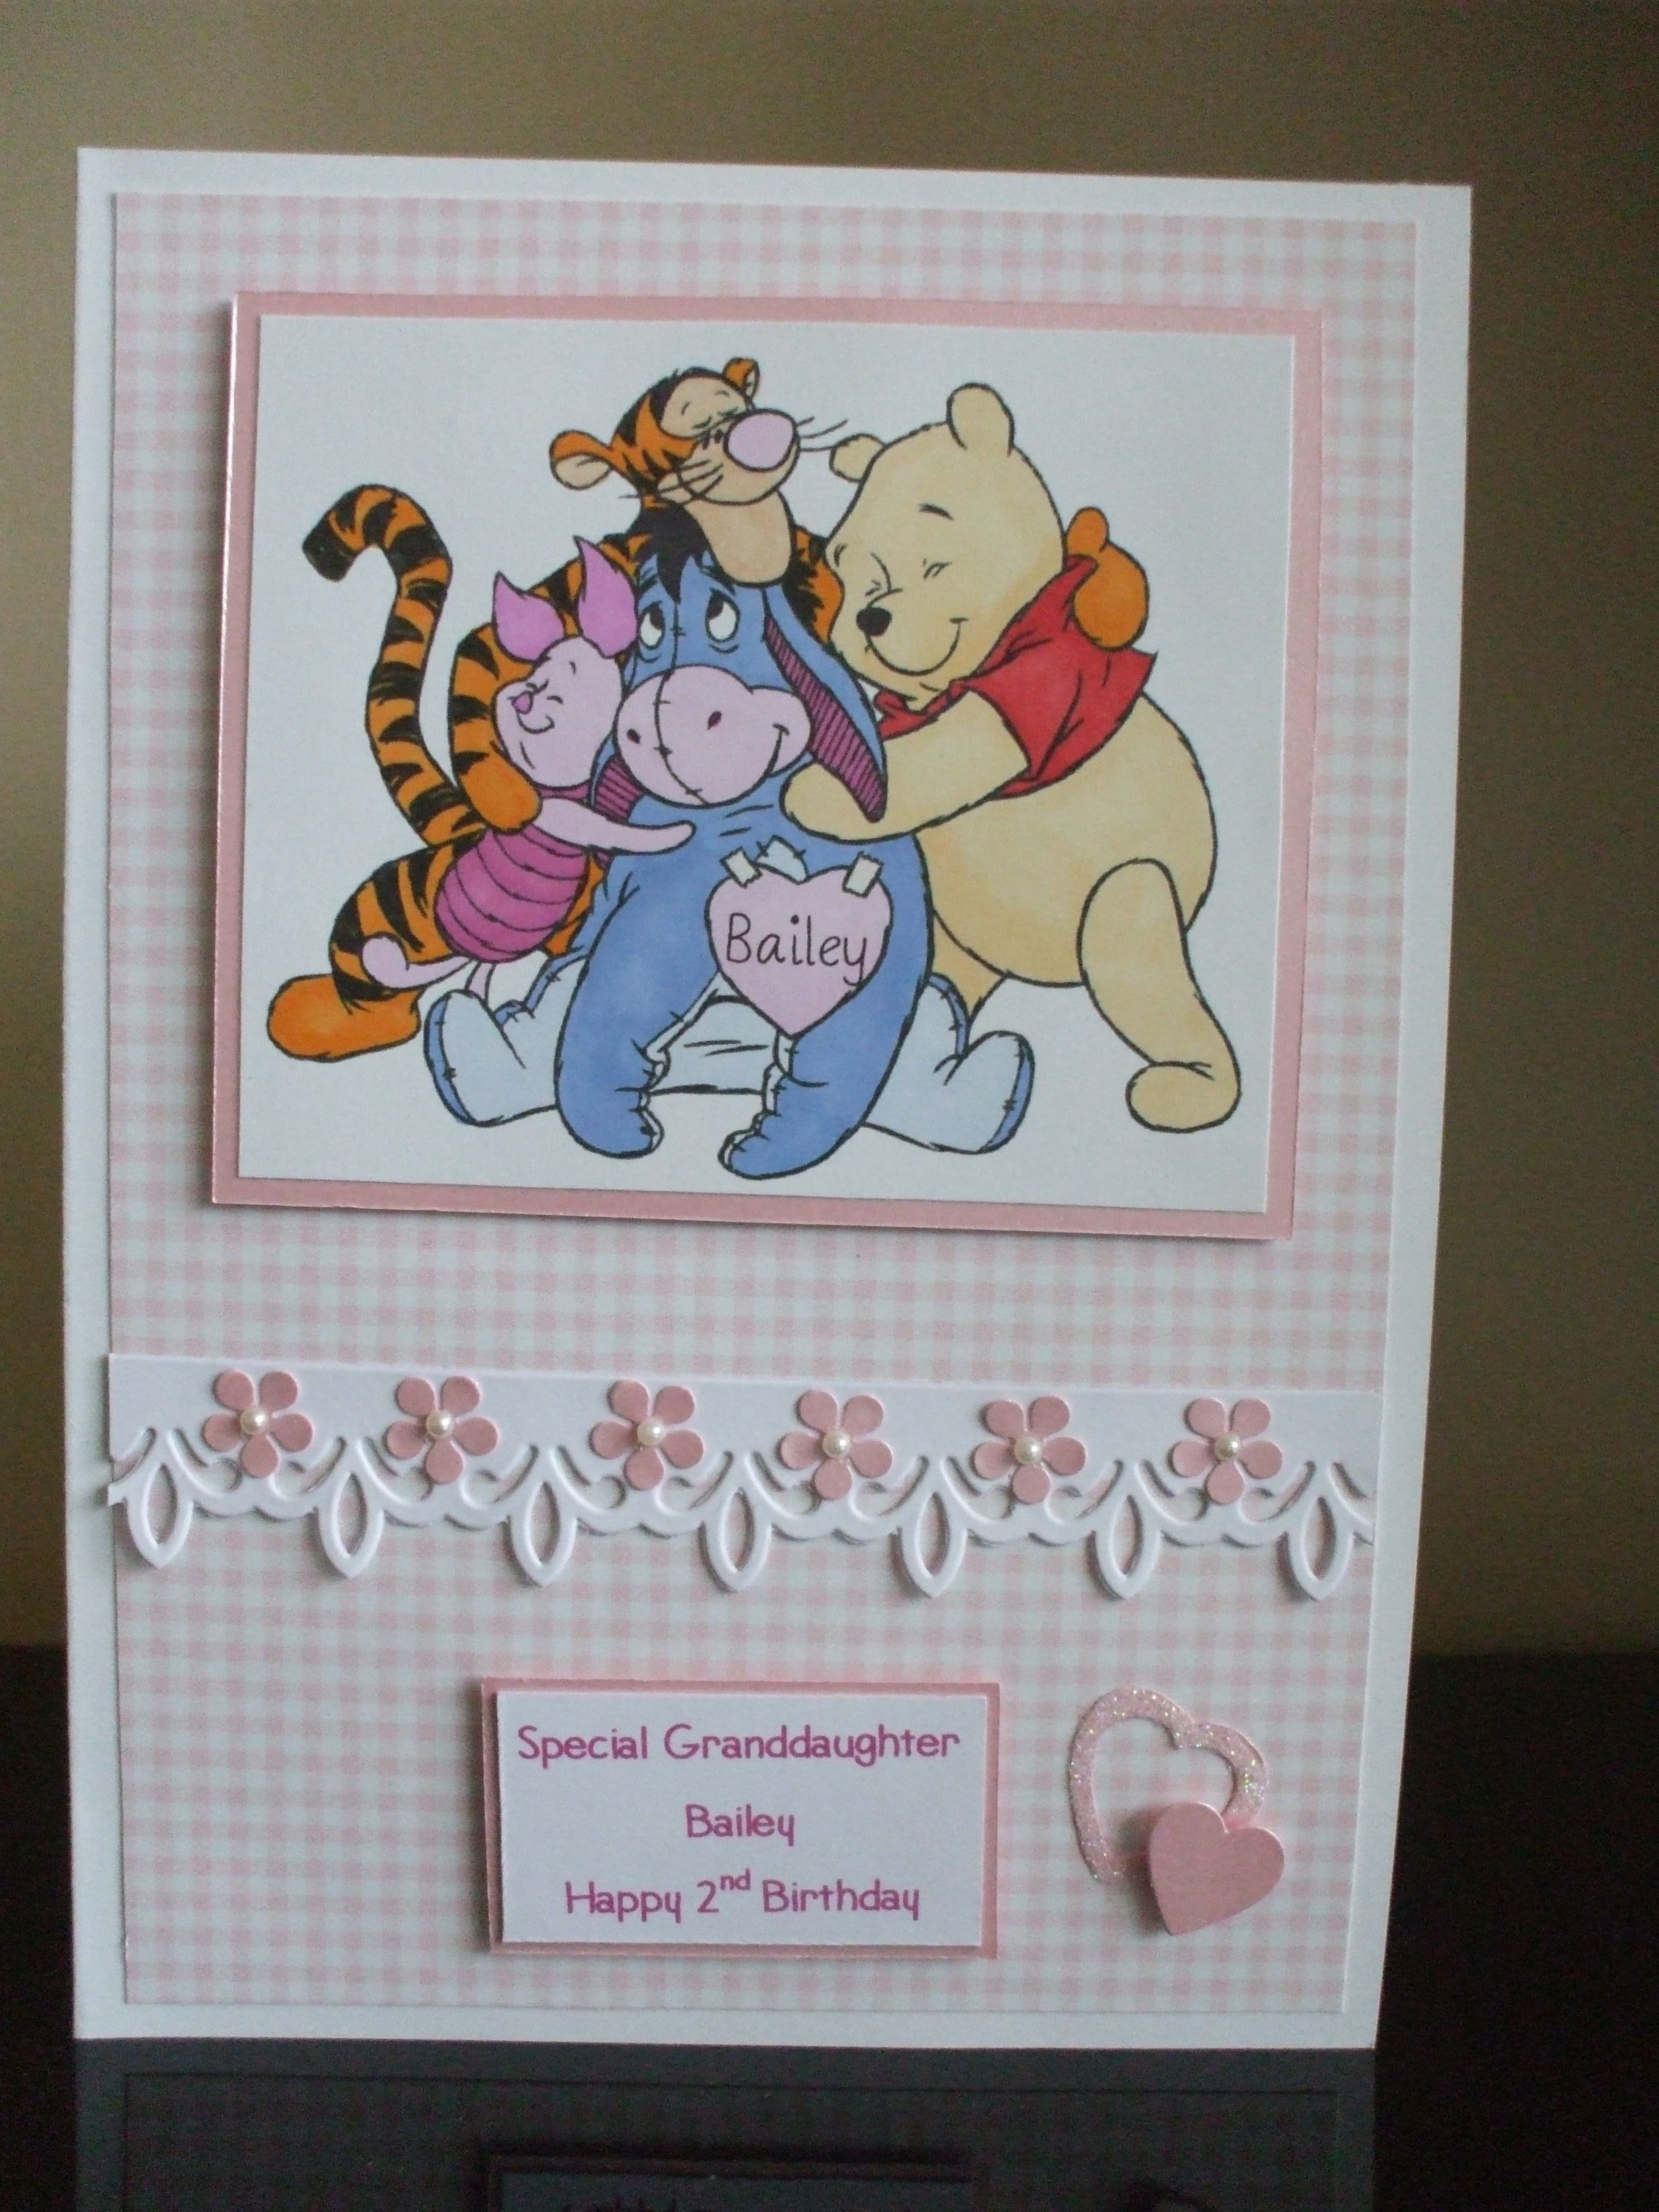 Handmade 2nd Birthday Card Granddaughter Winnie The Pooh Friends